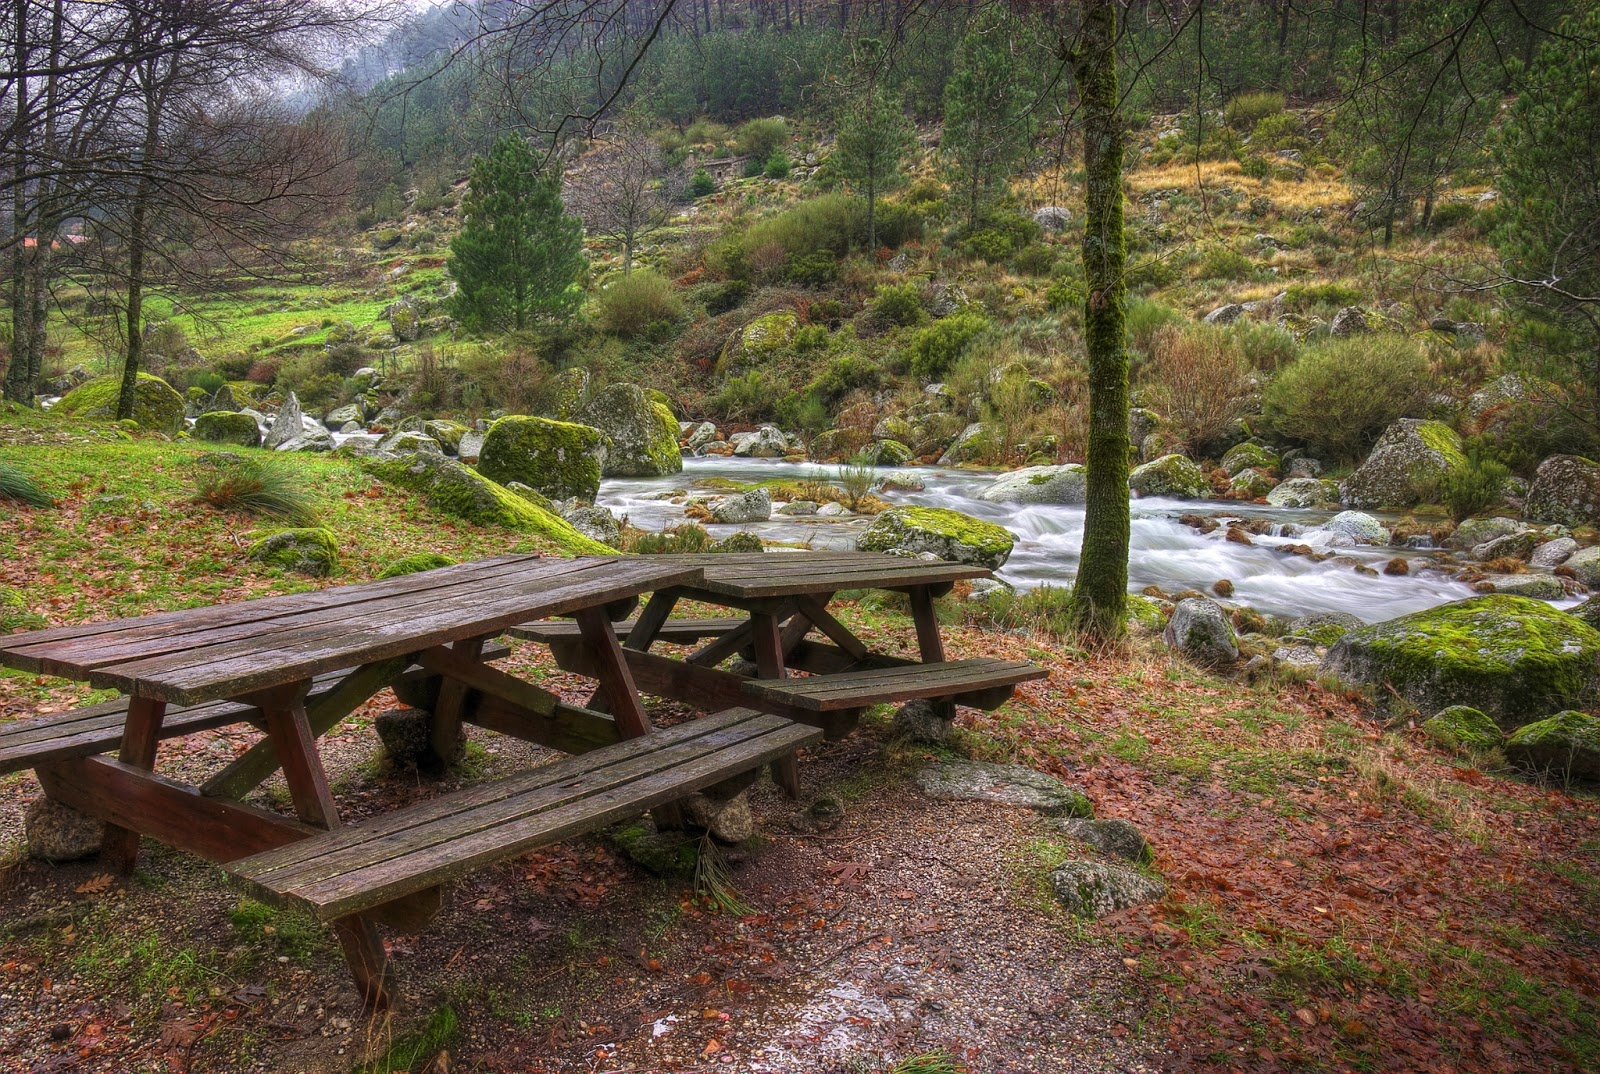 http://3.bp.blogspot.com/-2n5FWem0DjQ/UVUIVF9RVEI/AAAAAAABufQ/1VqjKk98Gbk/s1600/hermoso-paisaje-junto-al-r%C3%ADo-de-agua-cristalina-y-las-monta%C3%B1as-bosque-de-pinos.jpg